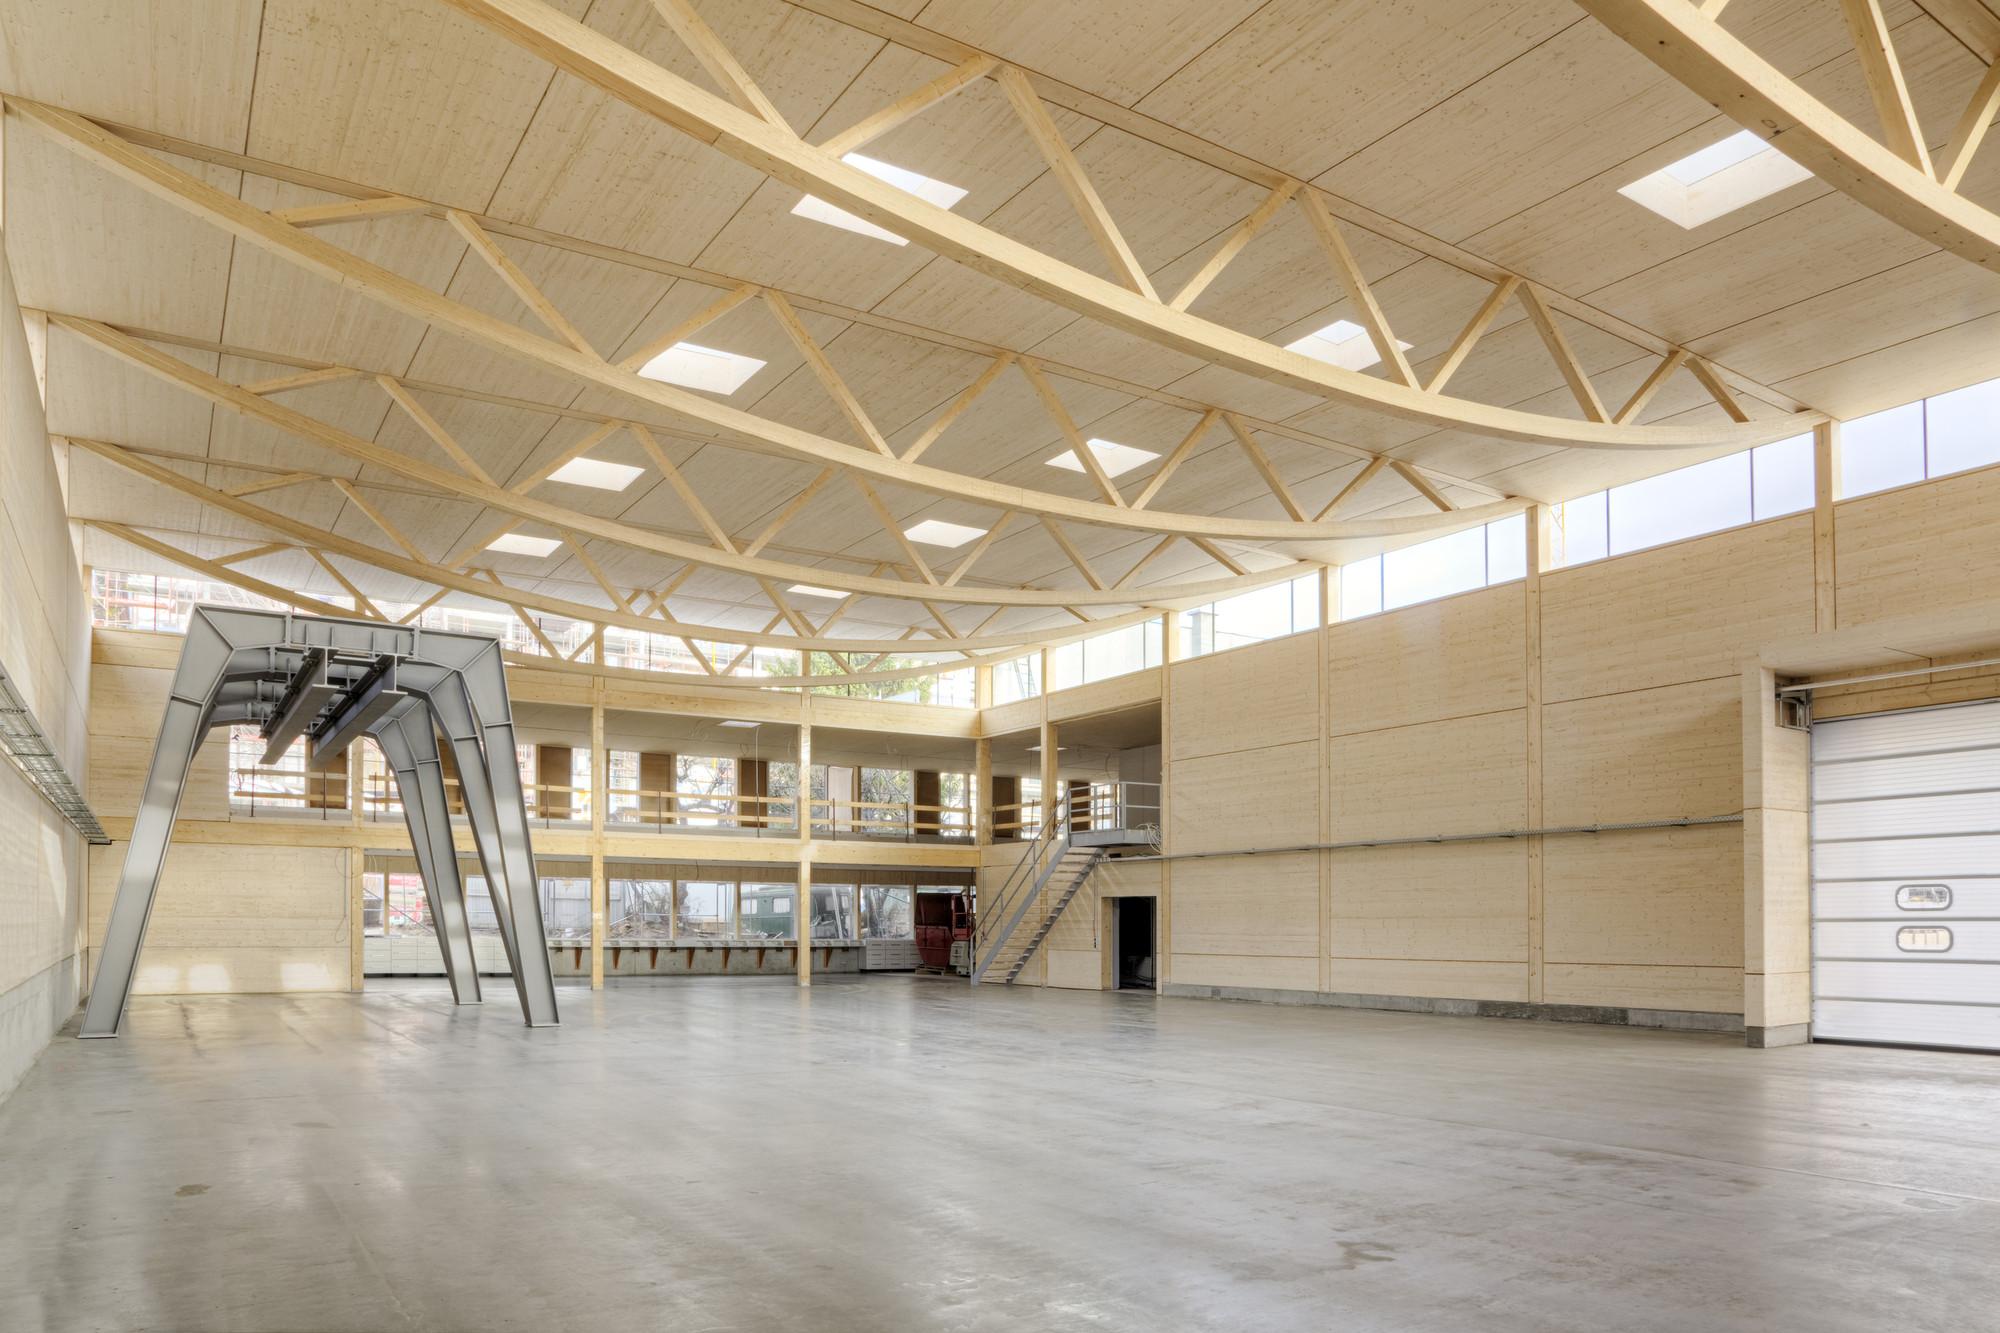 Gallery of Artis Headquarters / Roswag Architekten - 9